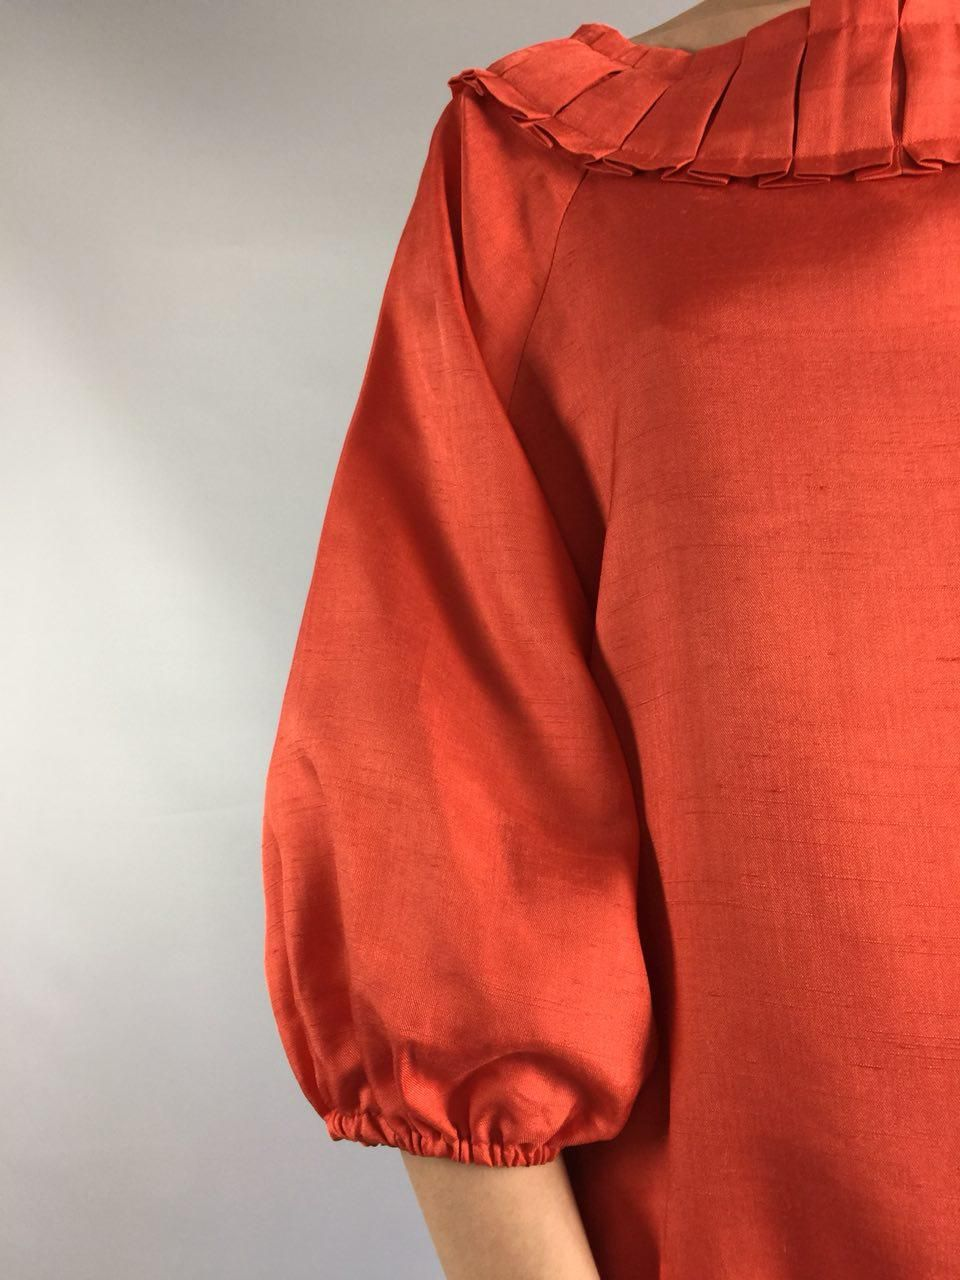 17827dc9d05 Orange 1990 s Vintage Silk Blouse Minimalist 3 4 Sleeves Women s Summer  Shirt Small Sz 6 Us Bohemian Peasant Hipster Top Victorian Style VTG